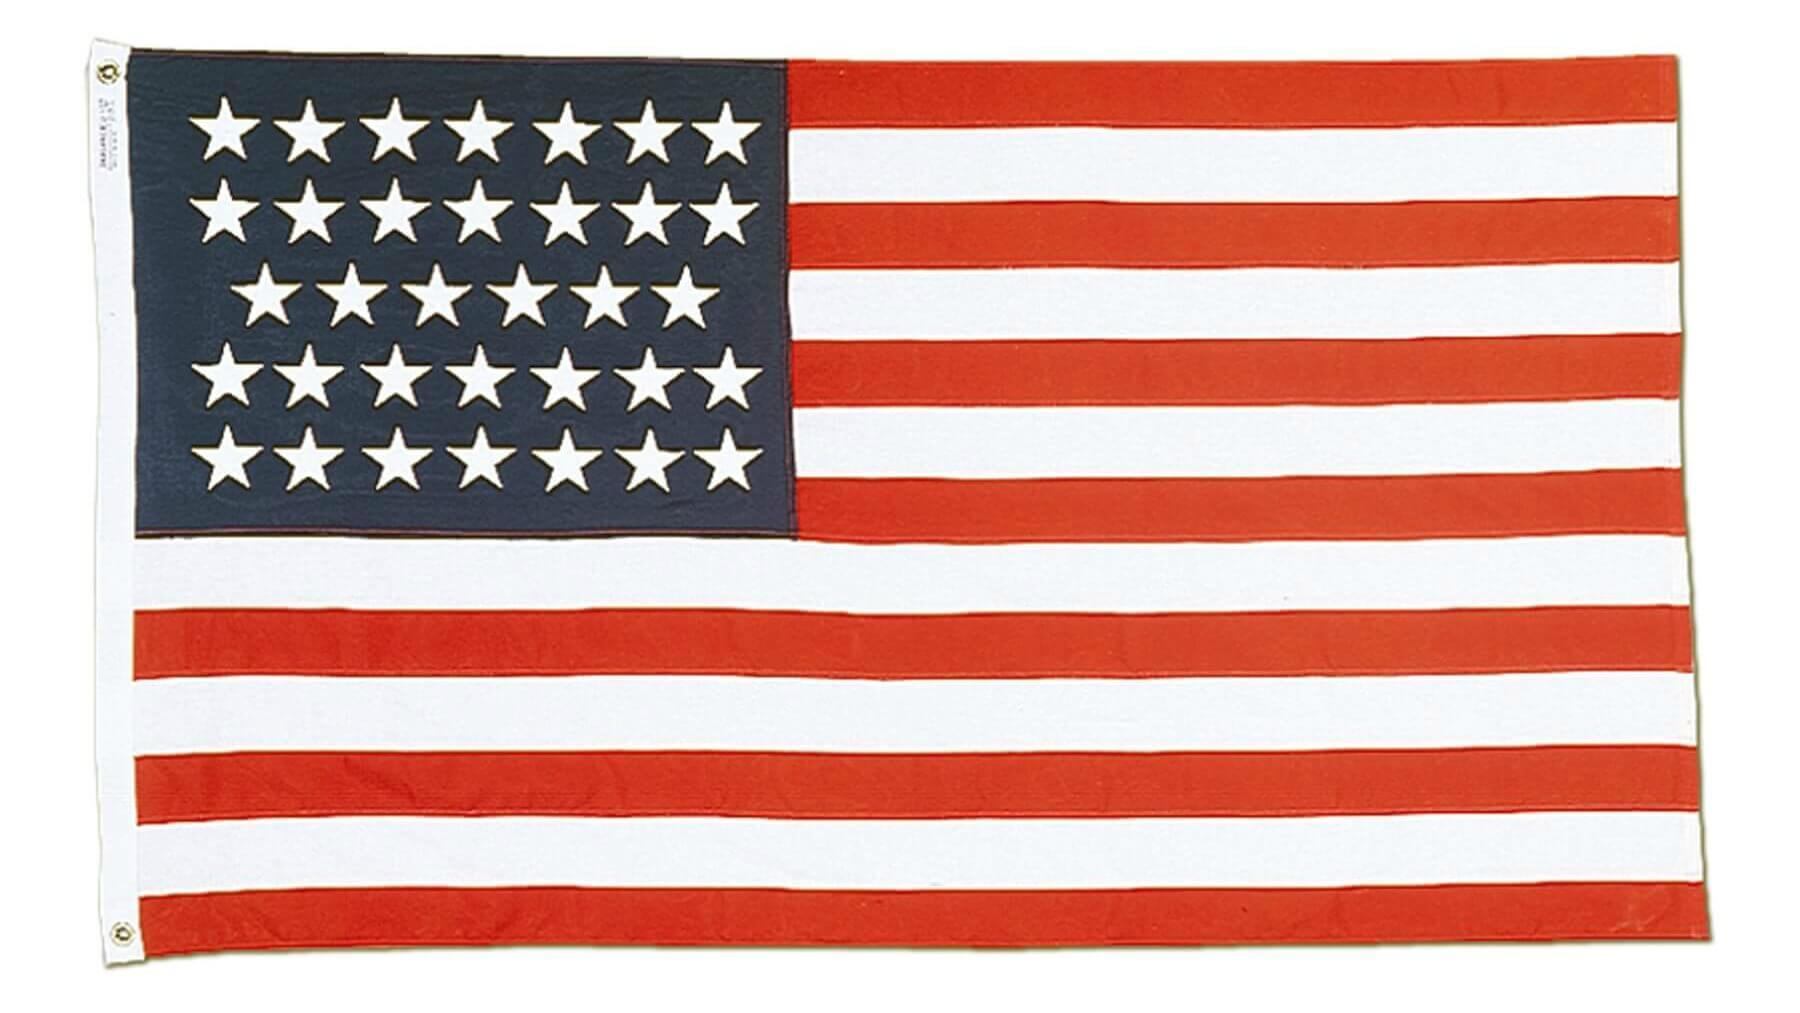 33 star U.S. flag